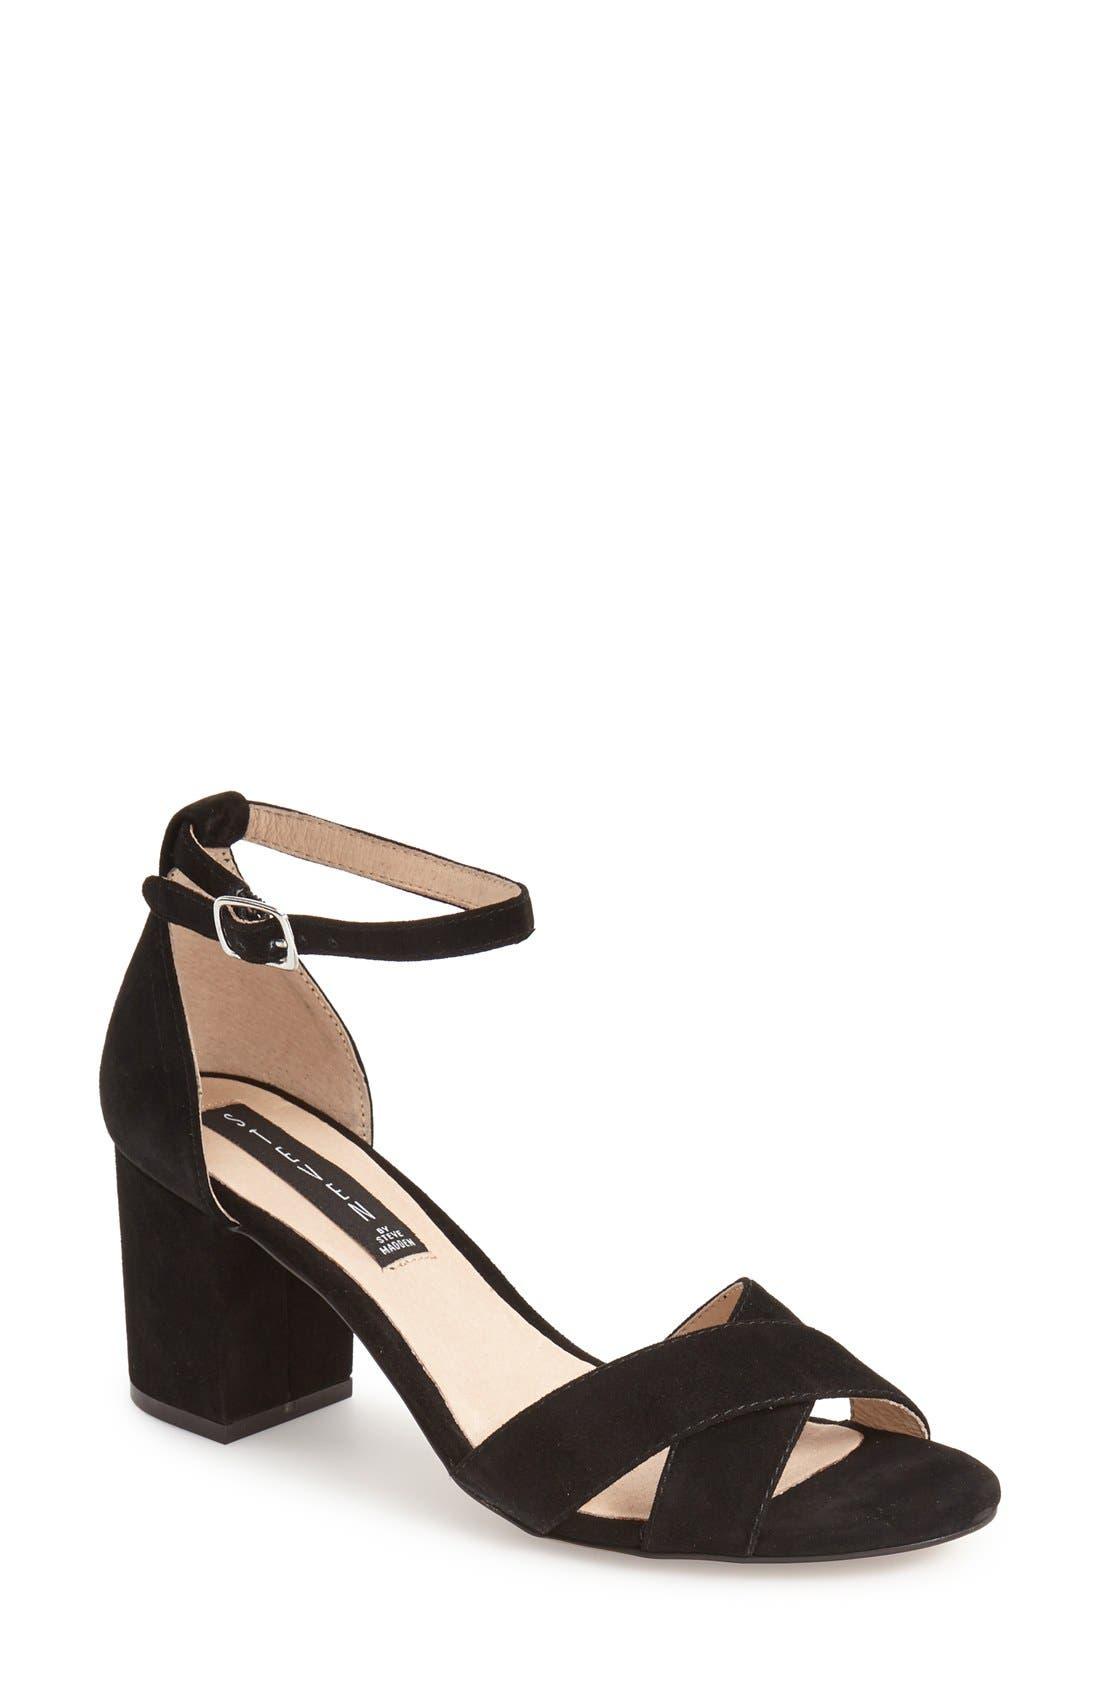 'Voomme' Ankle Strap Sandal,                         Main,                         color,